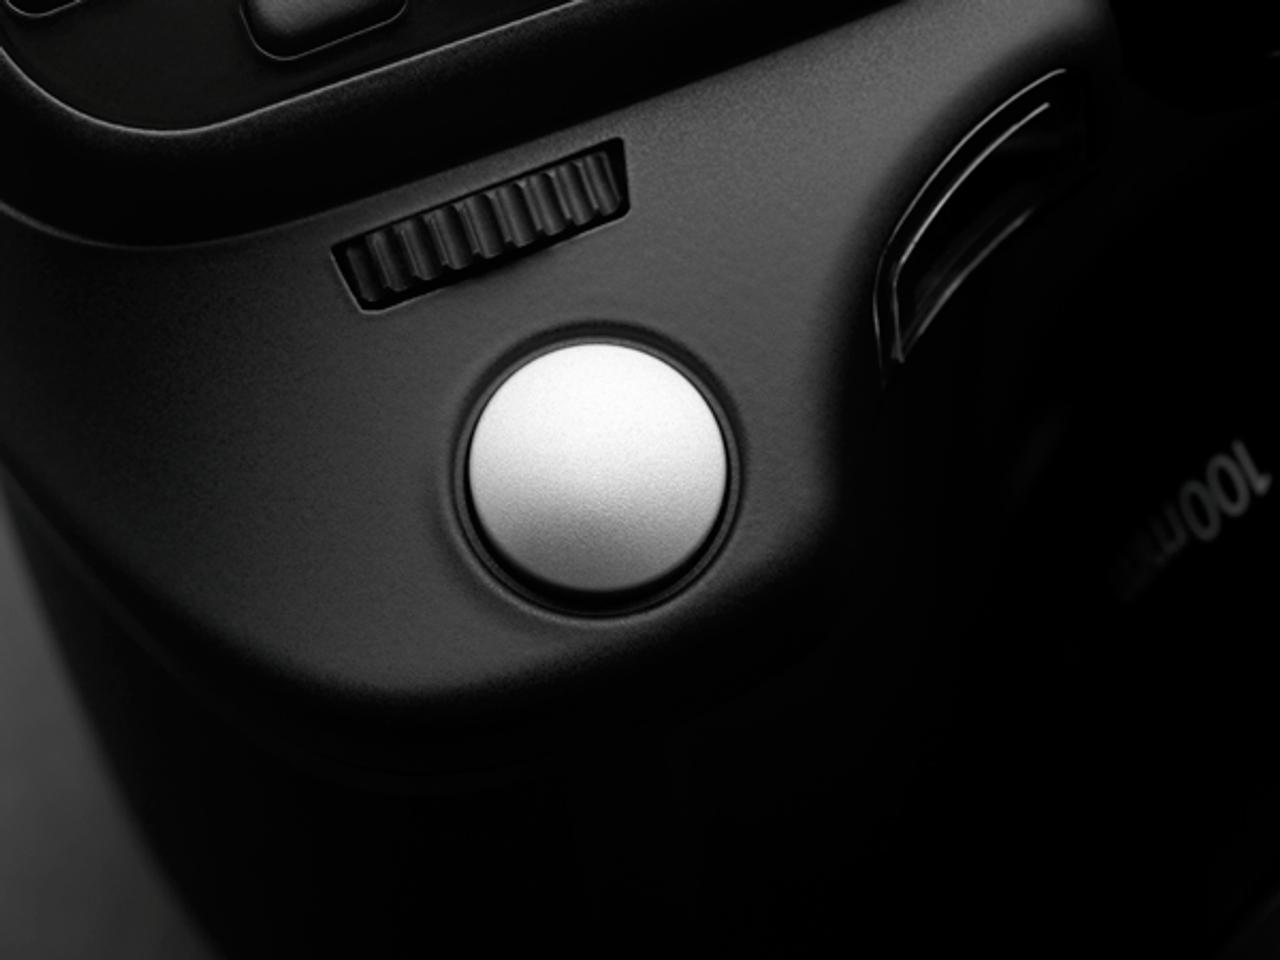 Hasselblad H5D-50 w/ HC 80mm Lens Kit